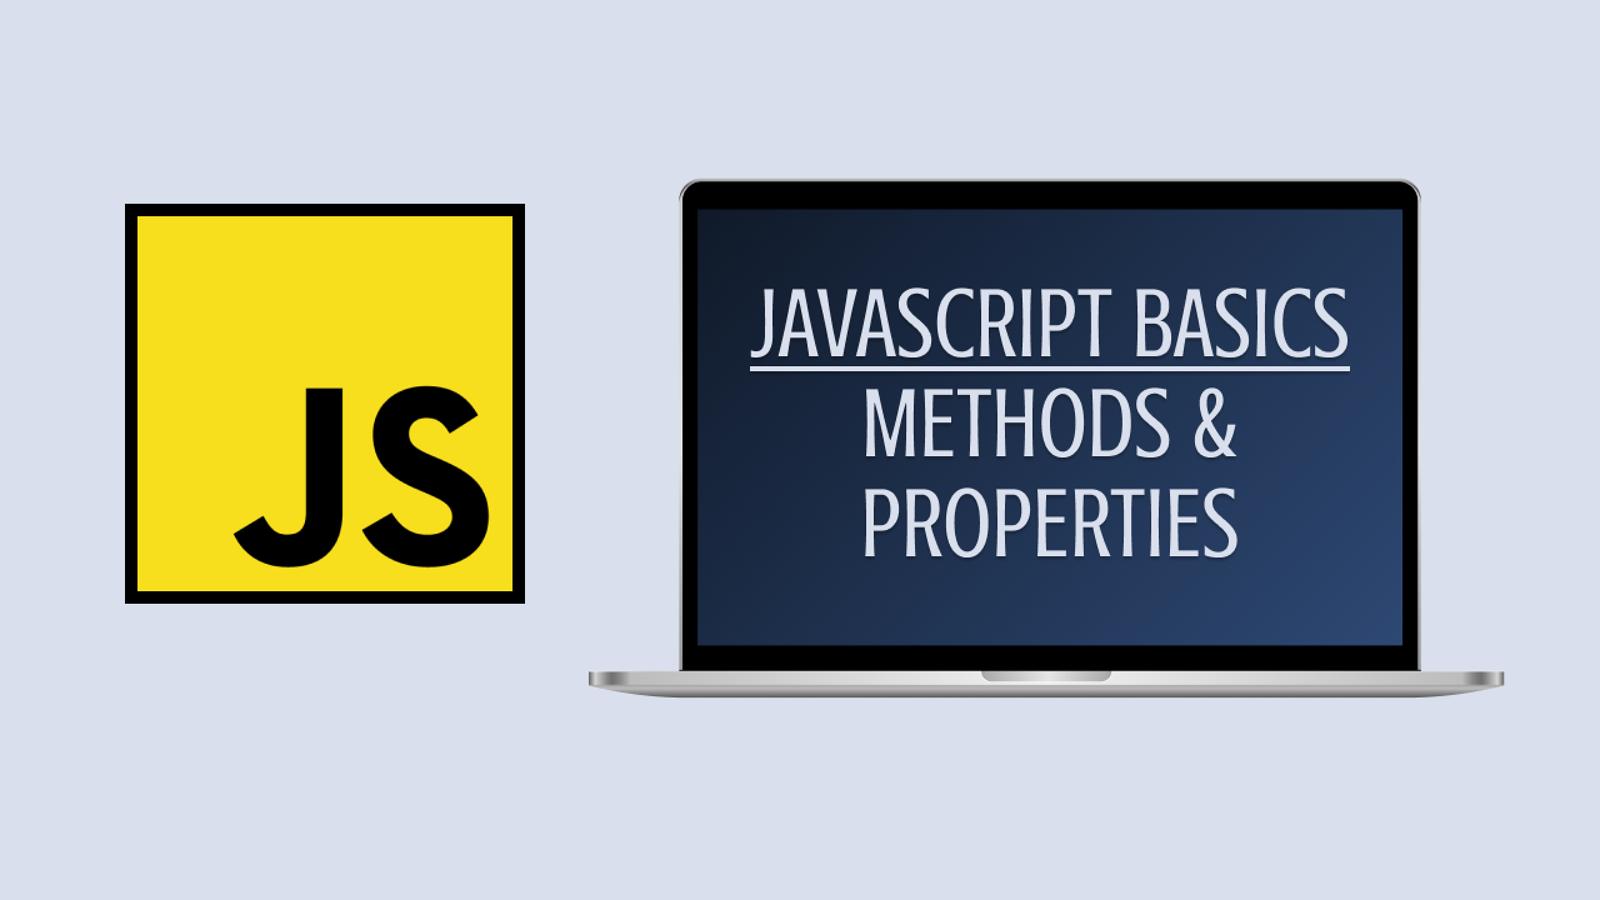 JavaScript Basics #7: Methods & Properties